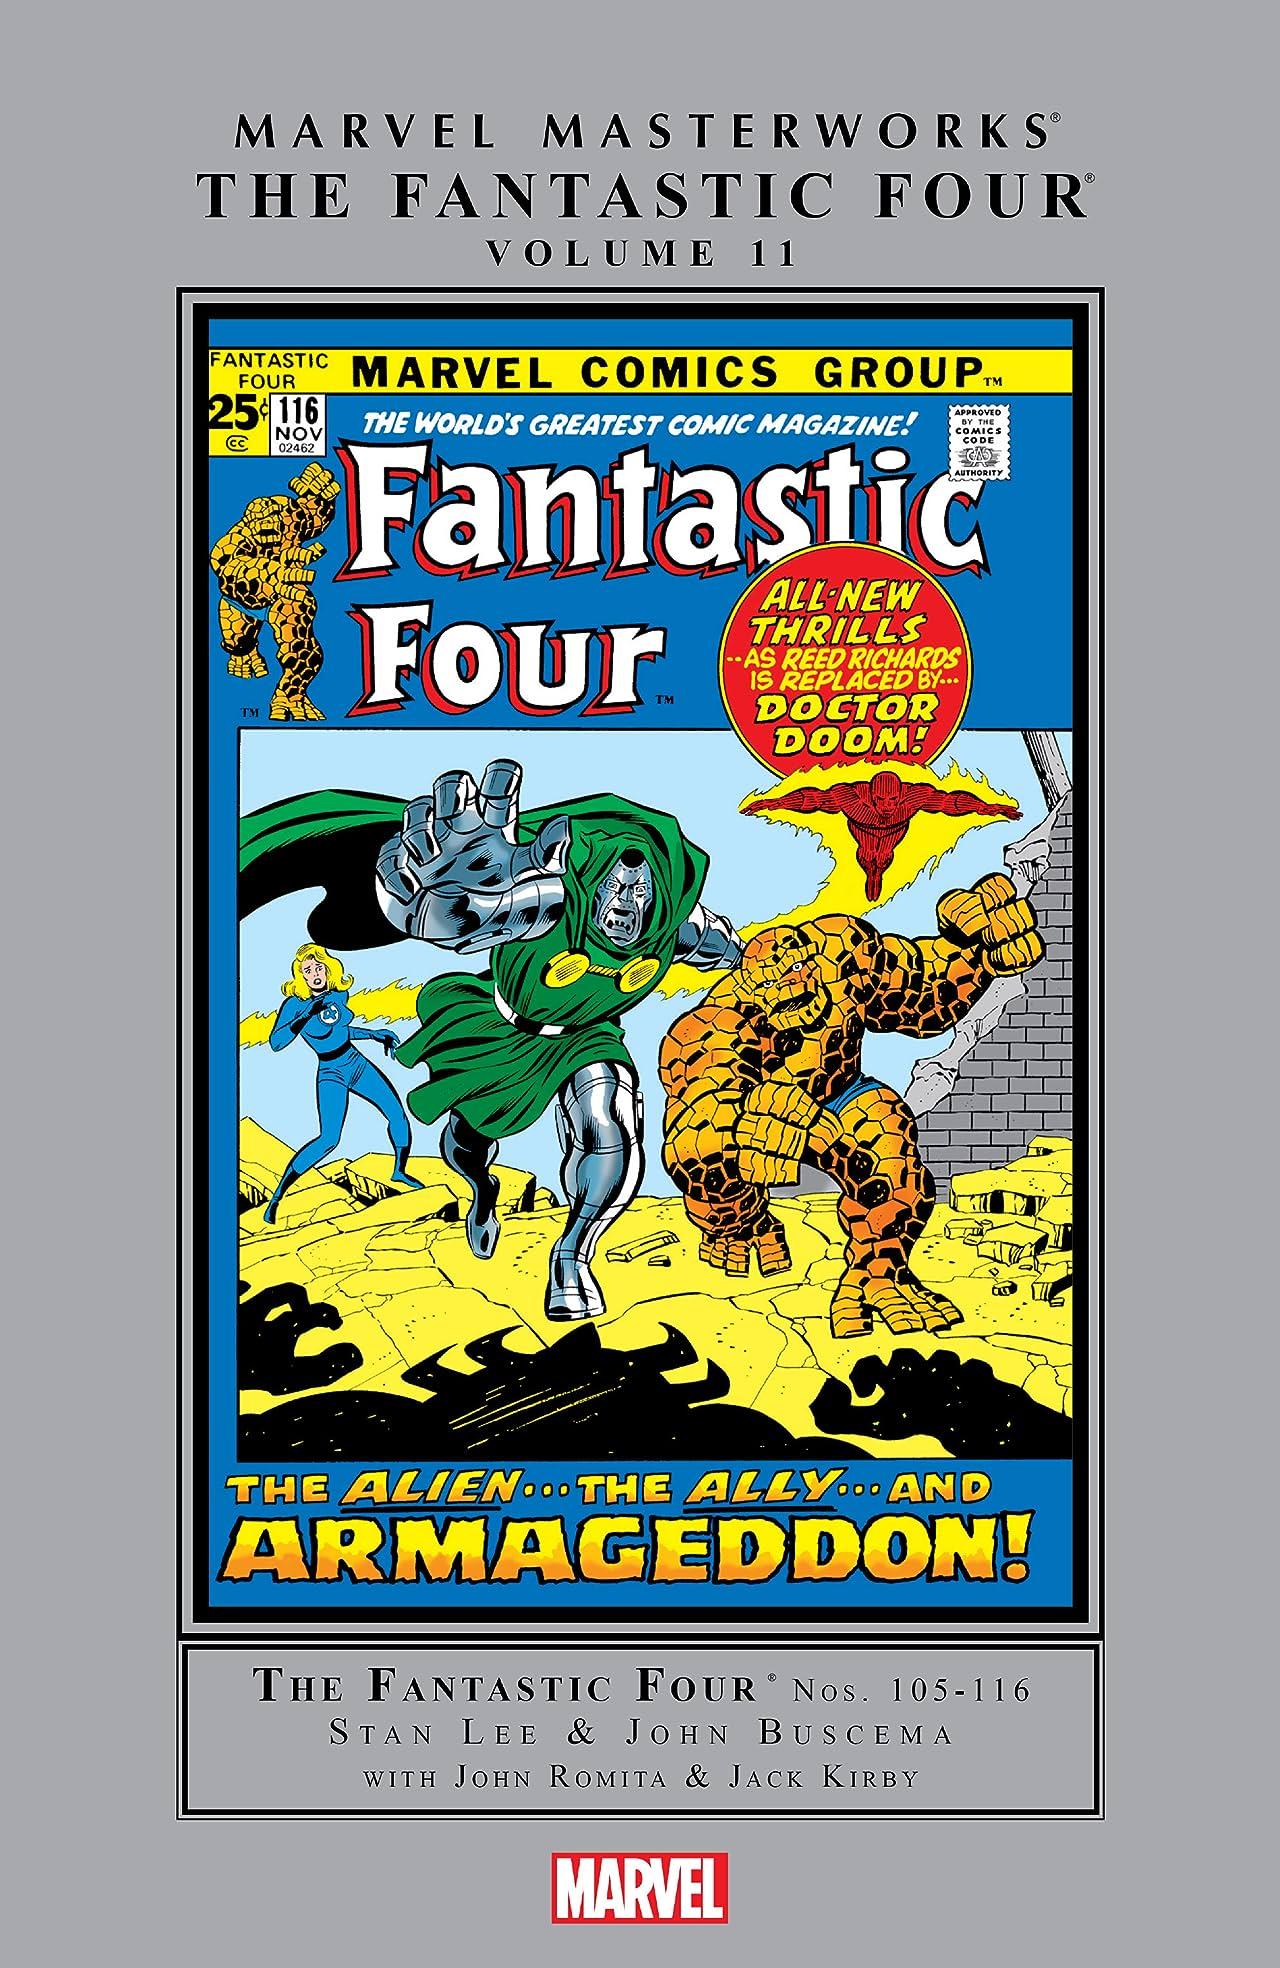 Fantastic Four Masterworks Vol. 11